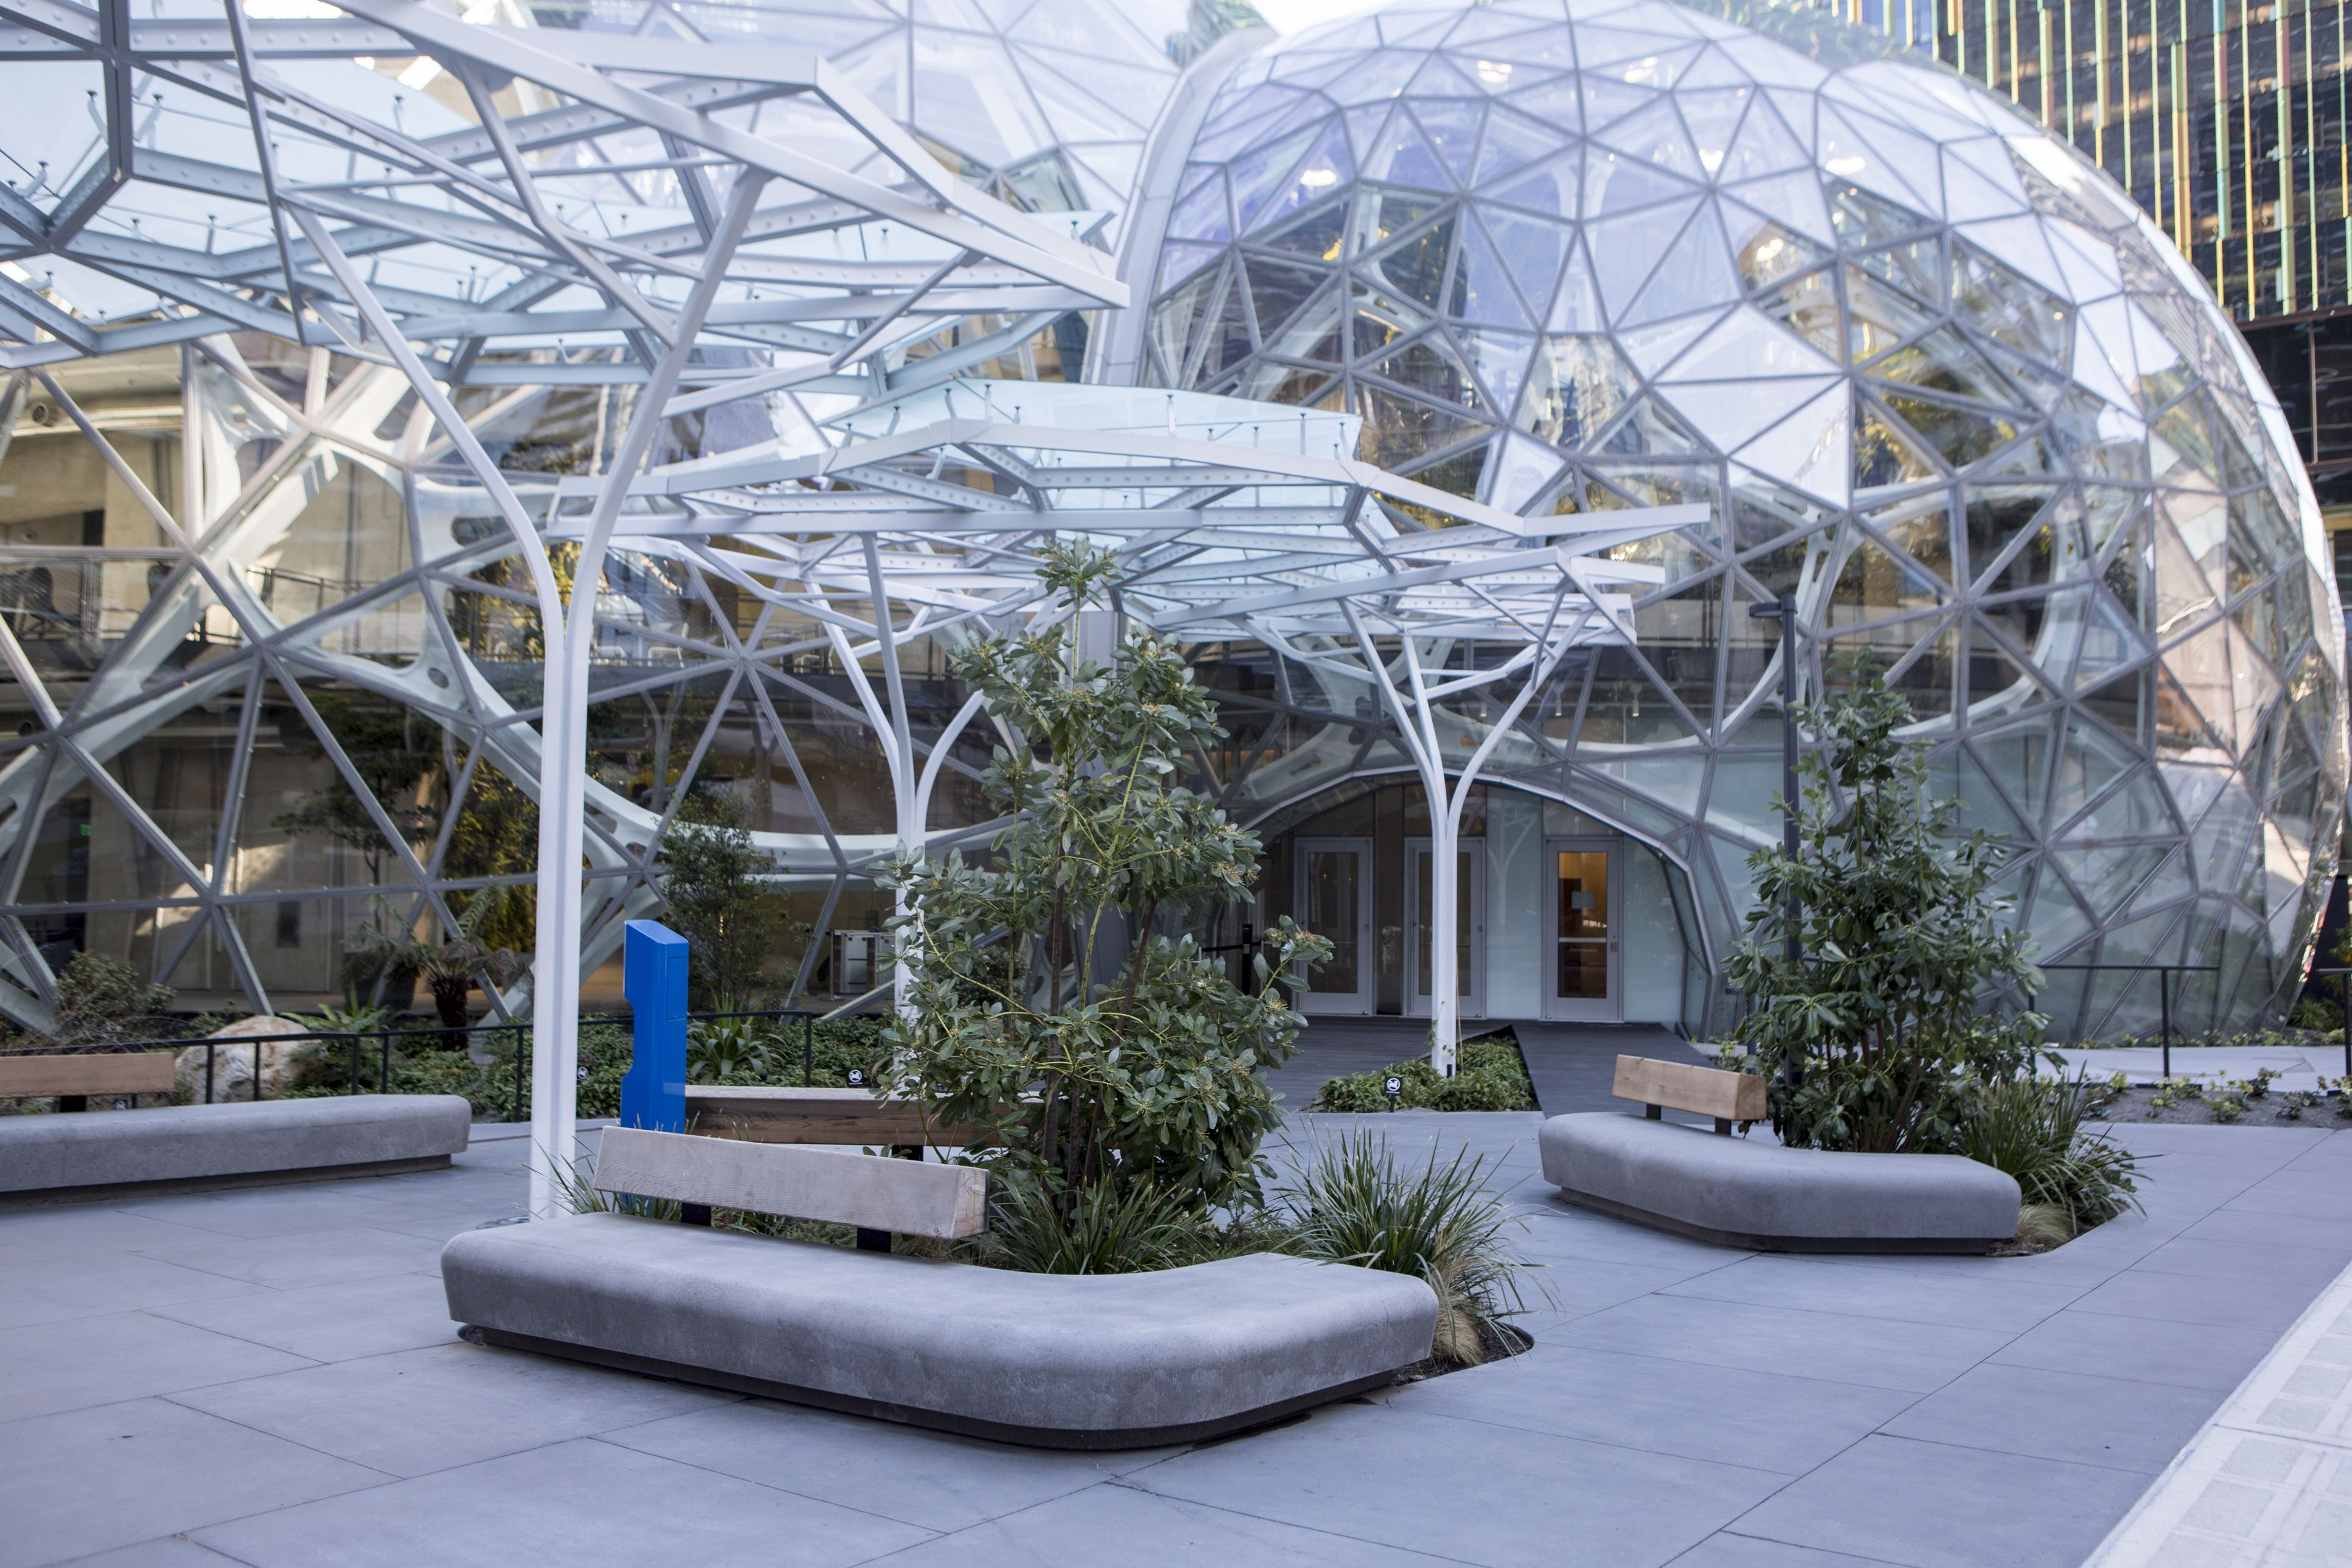 Amazon Spheres at Headquarters Building, Seattle Washington USA